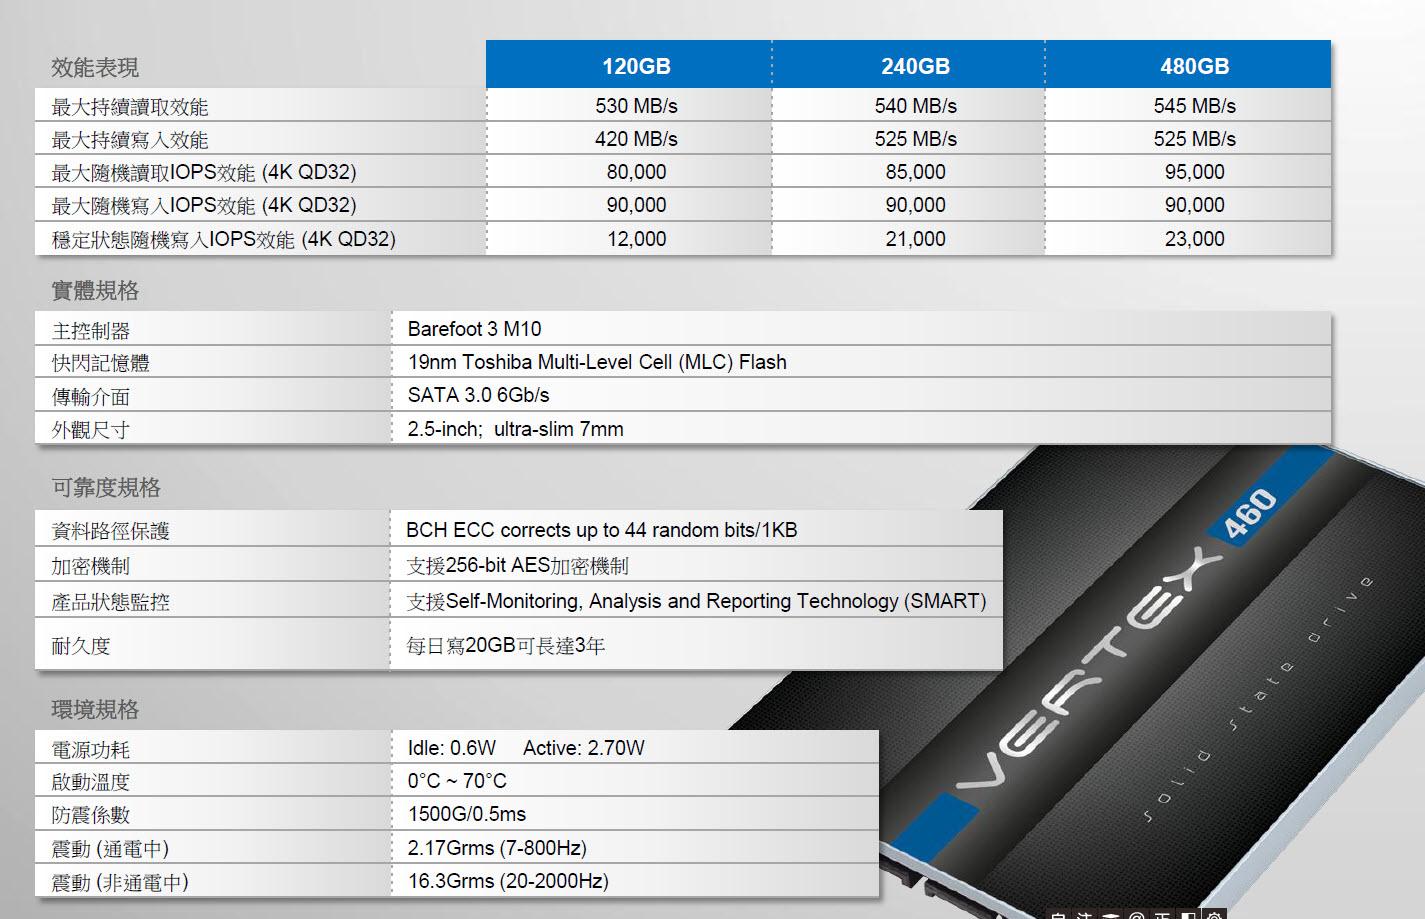 [XF]OCZ Vertex 460 240GB評測:高速、高容量、價位漂亮的好用系統碟